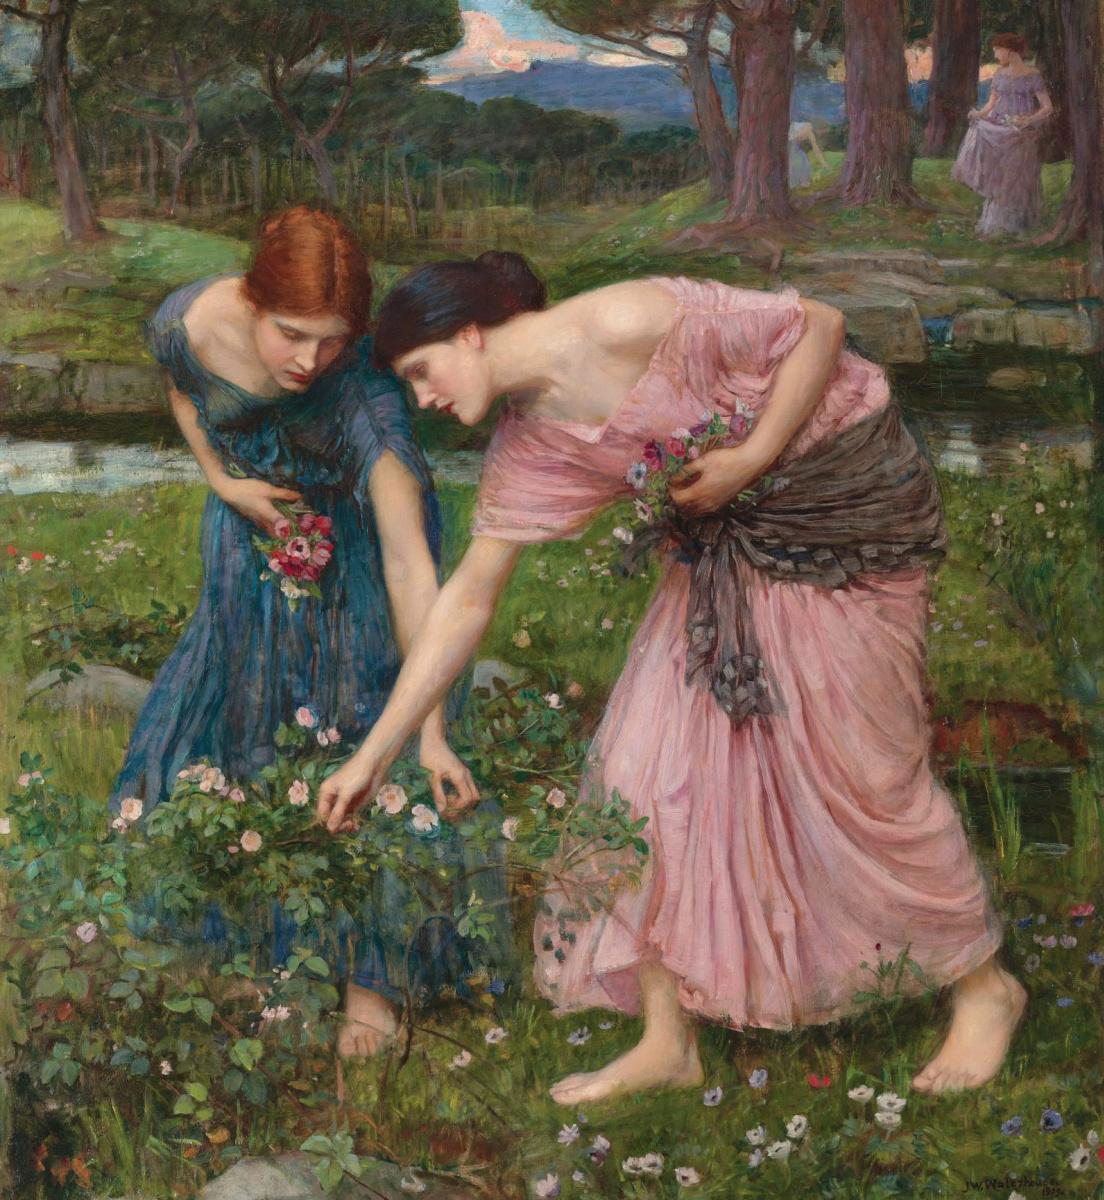 John William Waterhouse. Pluck roses as soon as possible